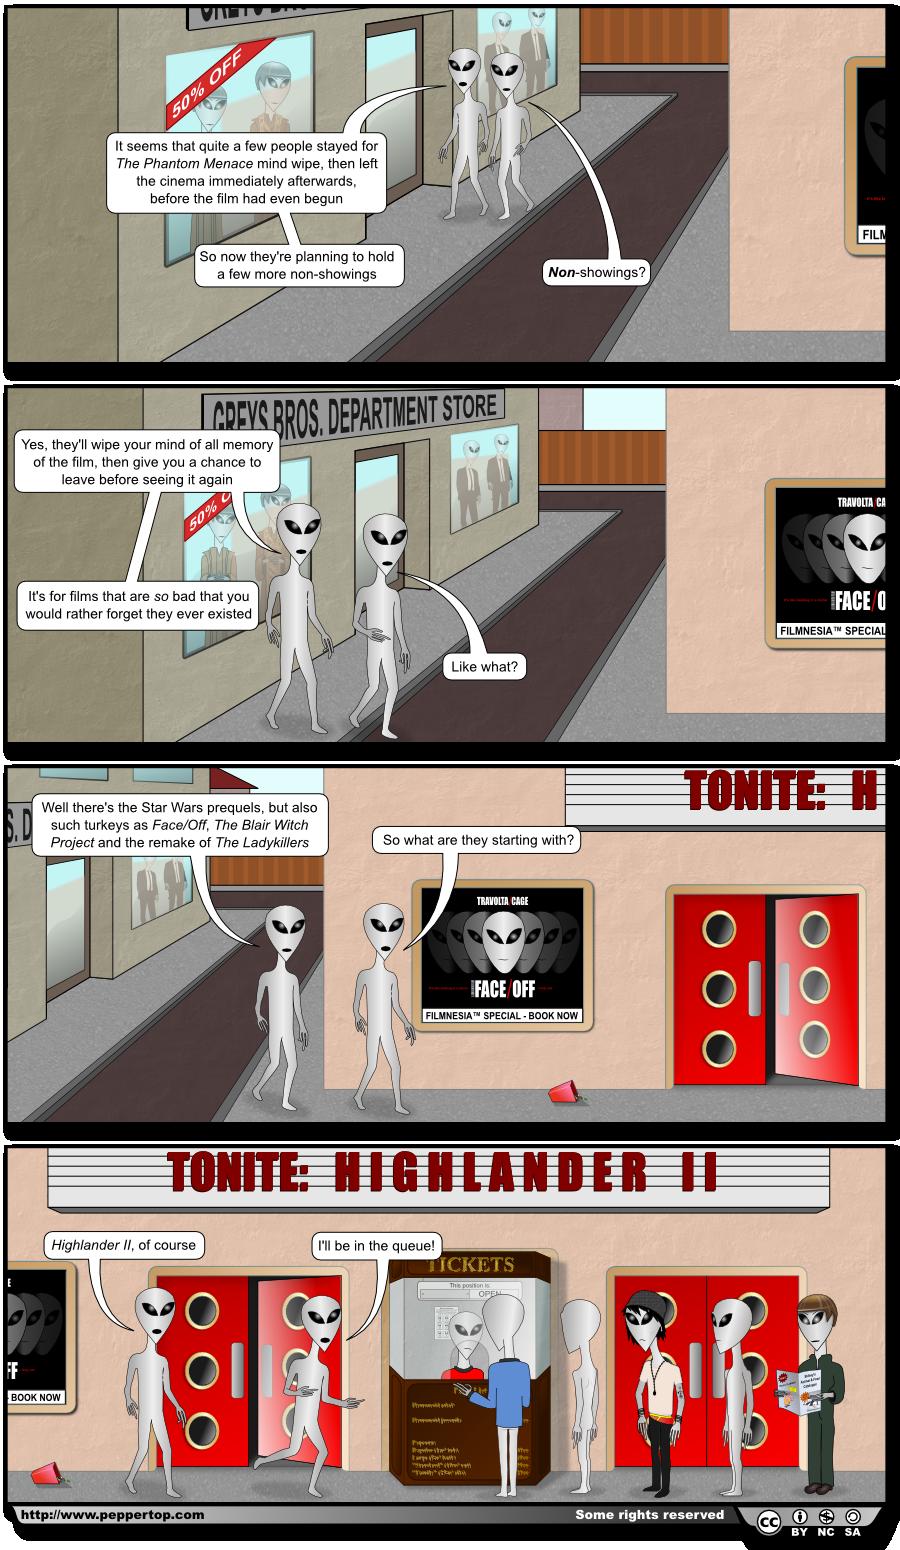 Filmnesia Part III